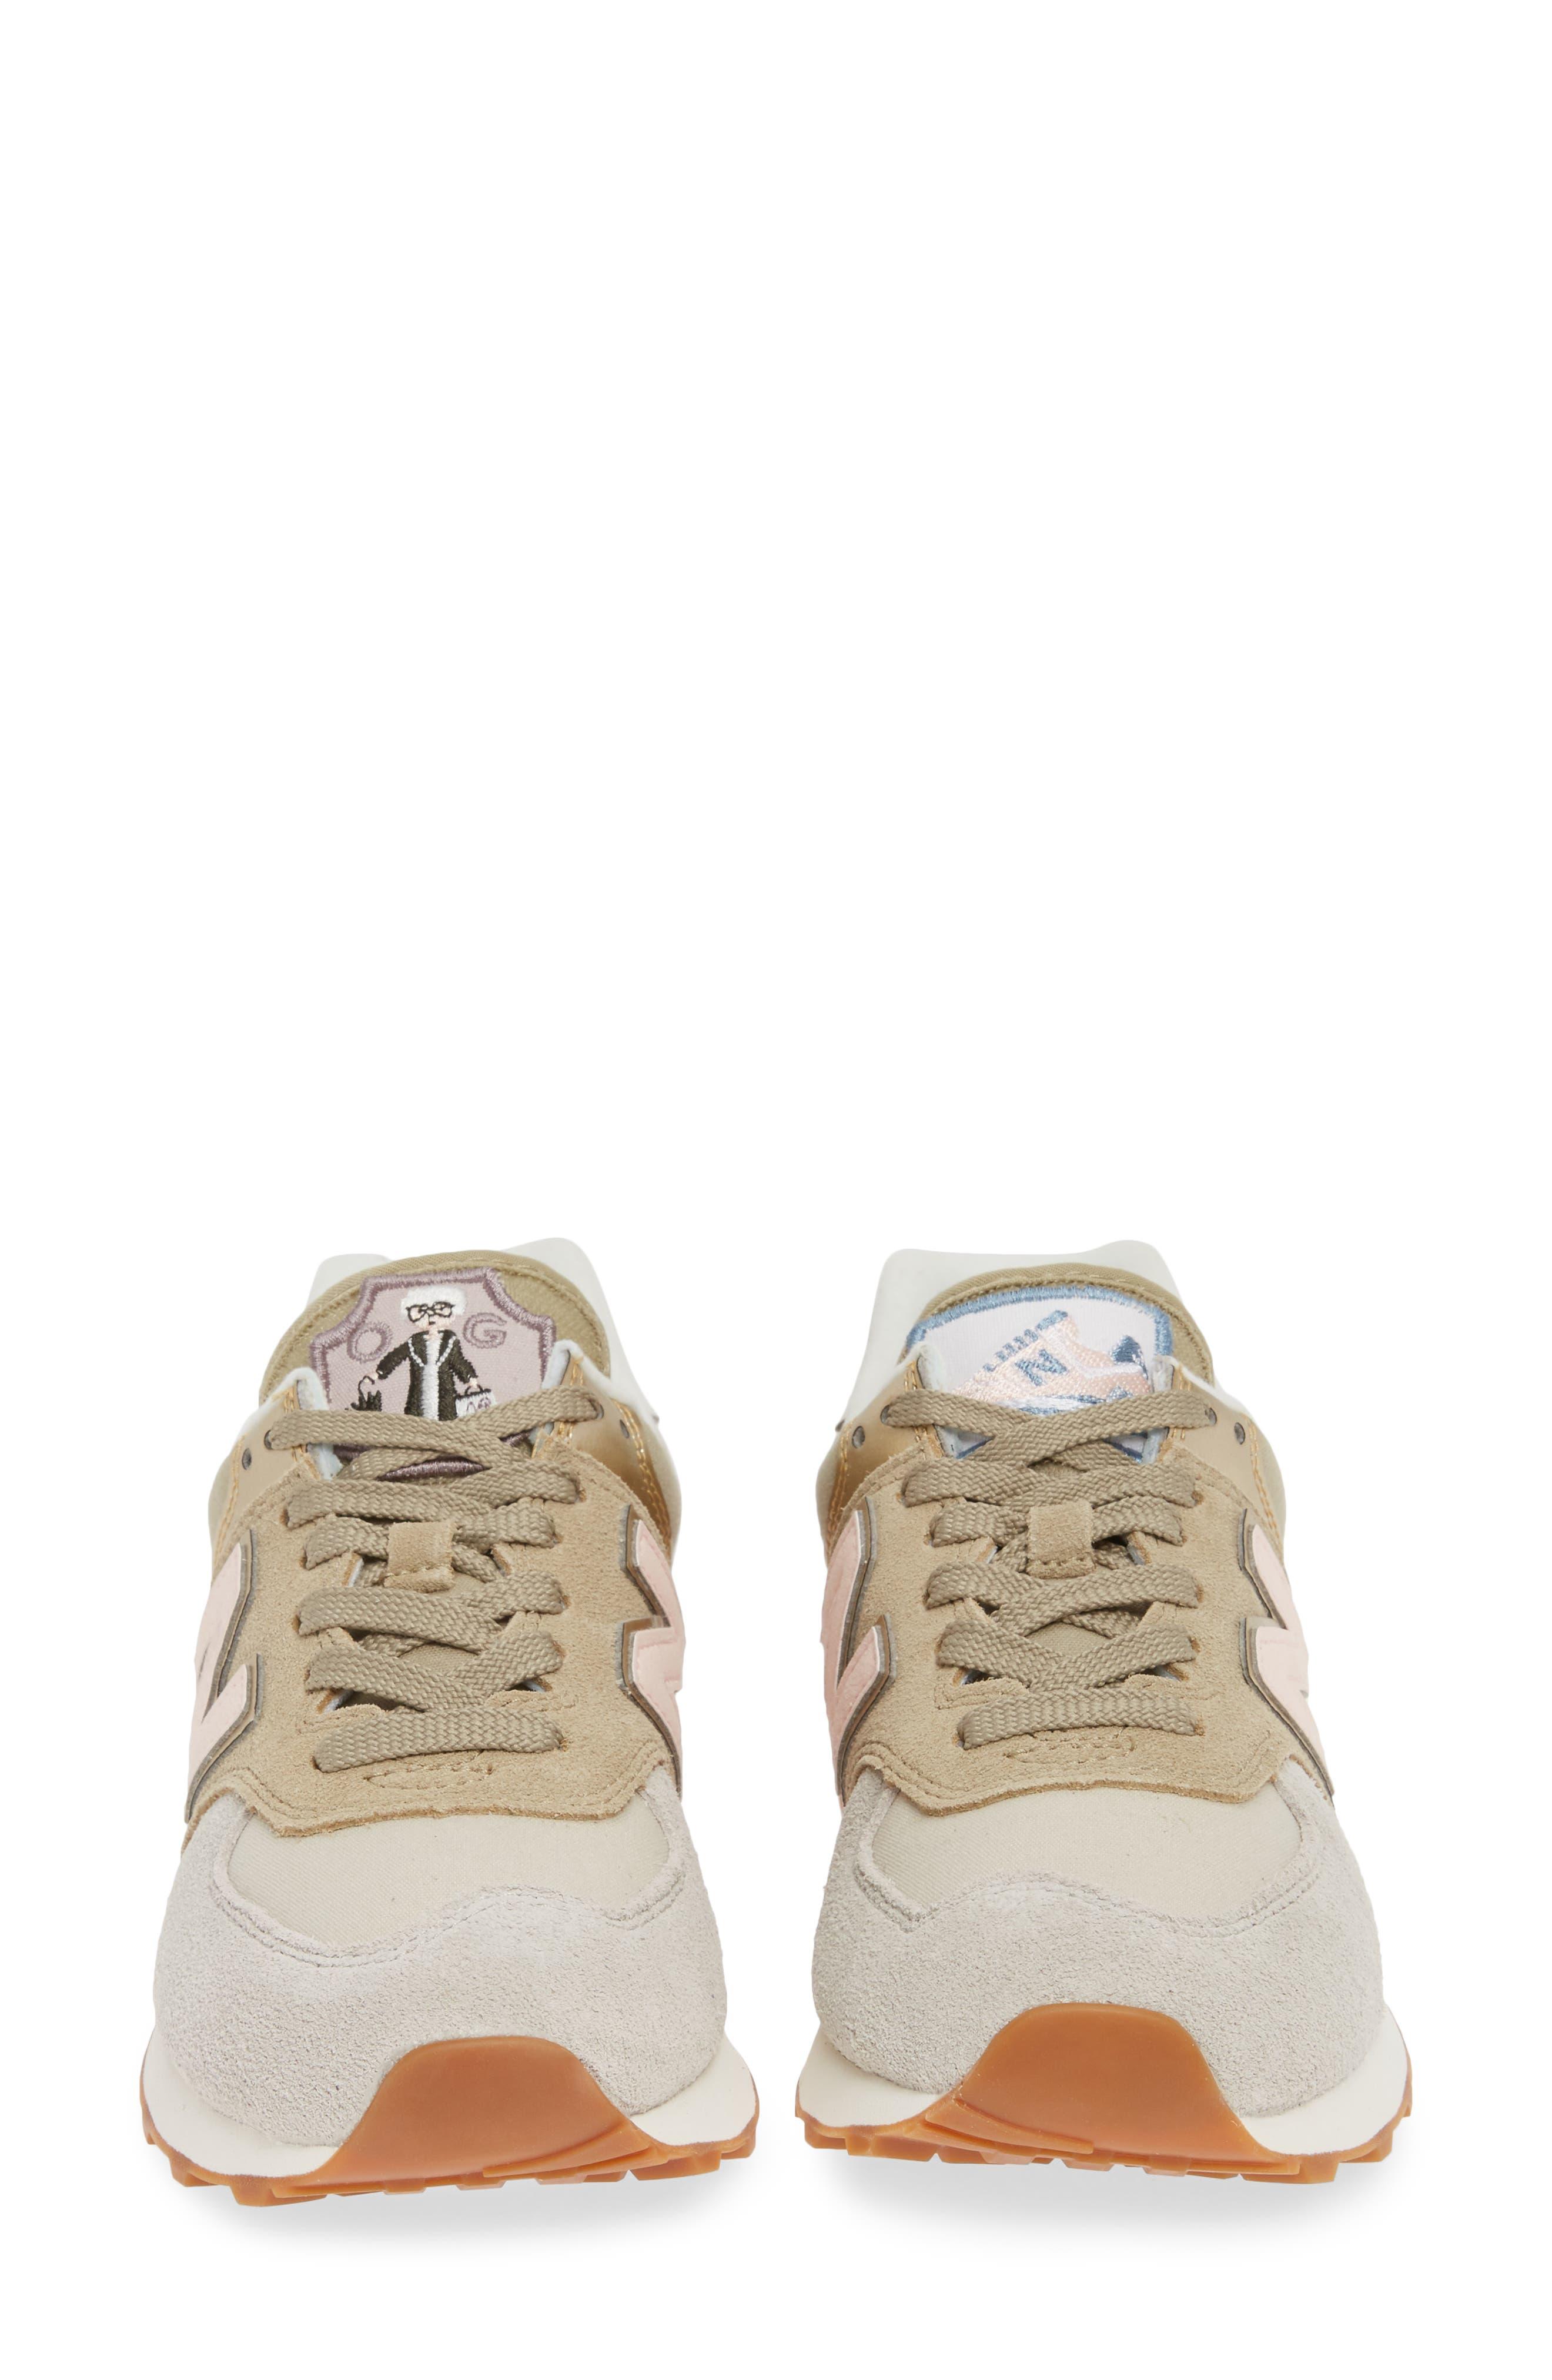 NEW BALANCE, 574 Metallic Patch Sneaker, Alternate thumbnail 4, color, LIGHT CLIFF GREY